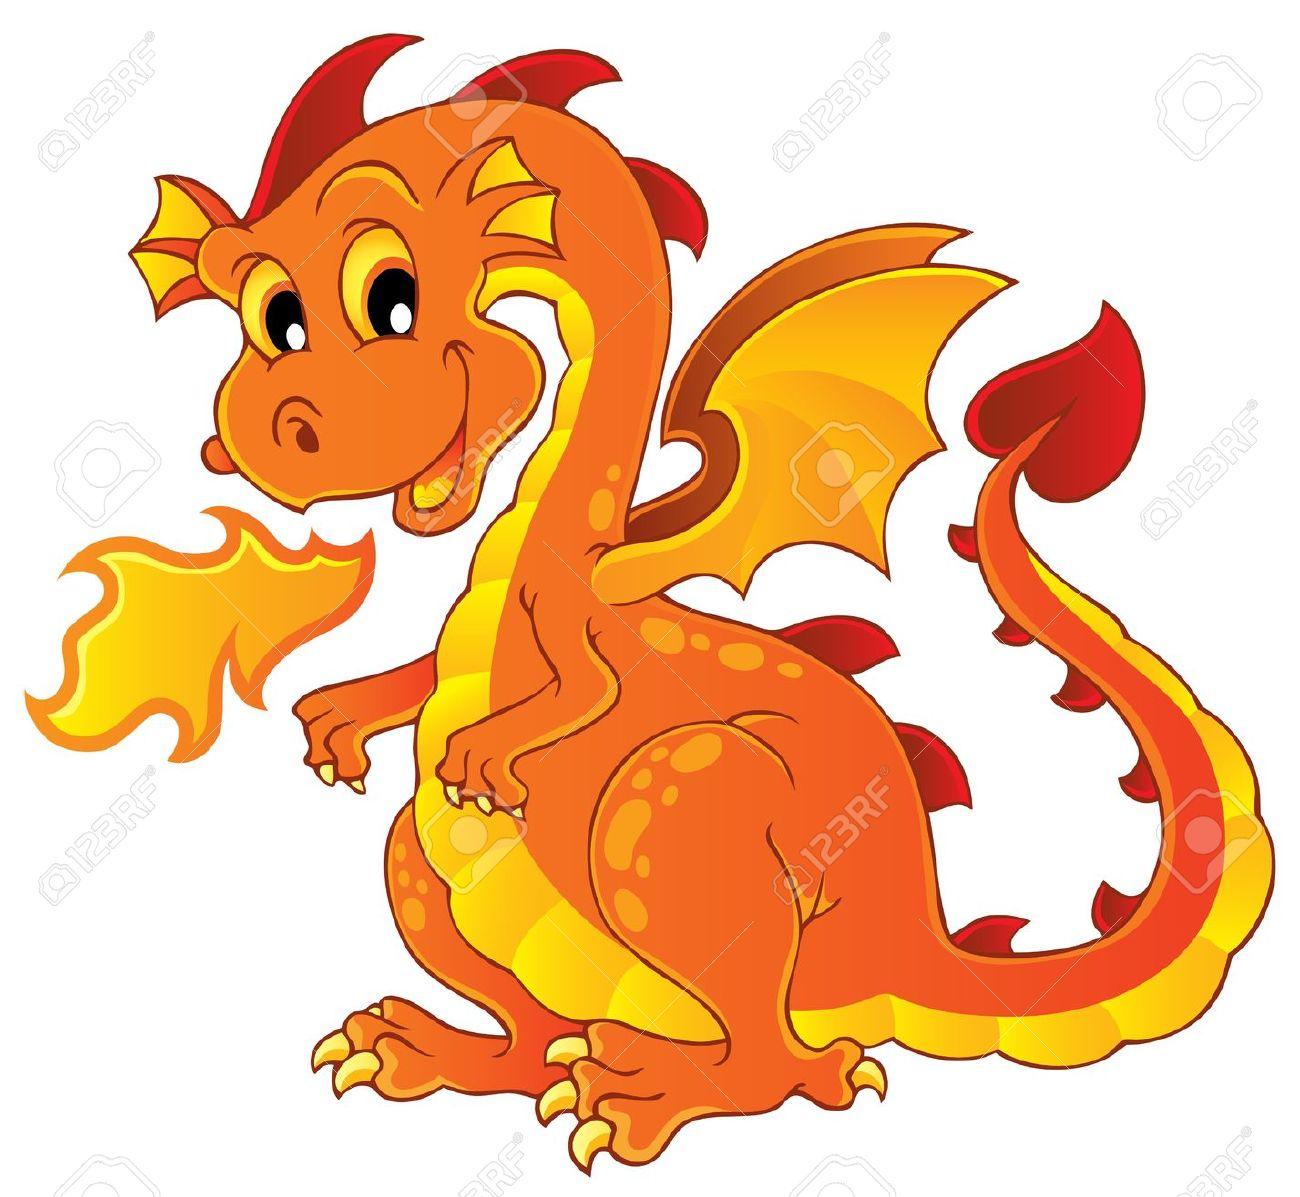 Dragon Clipart .-Dragon Clipart .-10